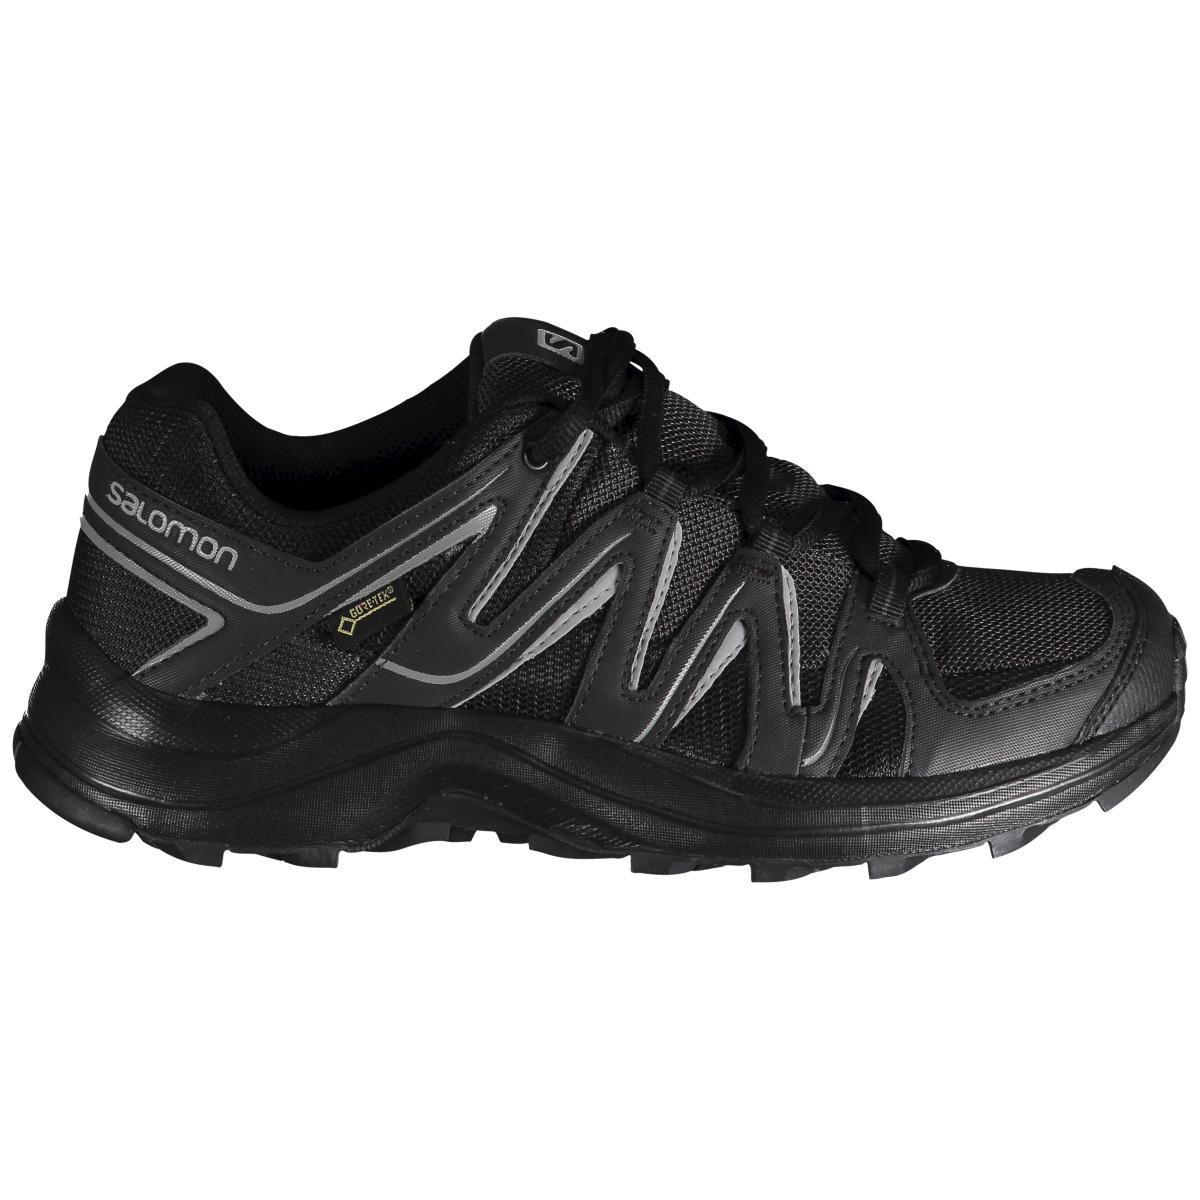 c74fa105 Køb Salomon shoes XA Thena GTX herre dame kvinde asphalt grå black ...